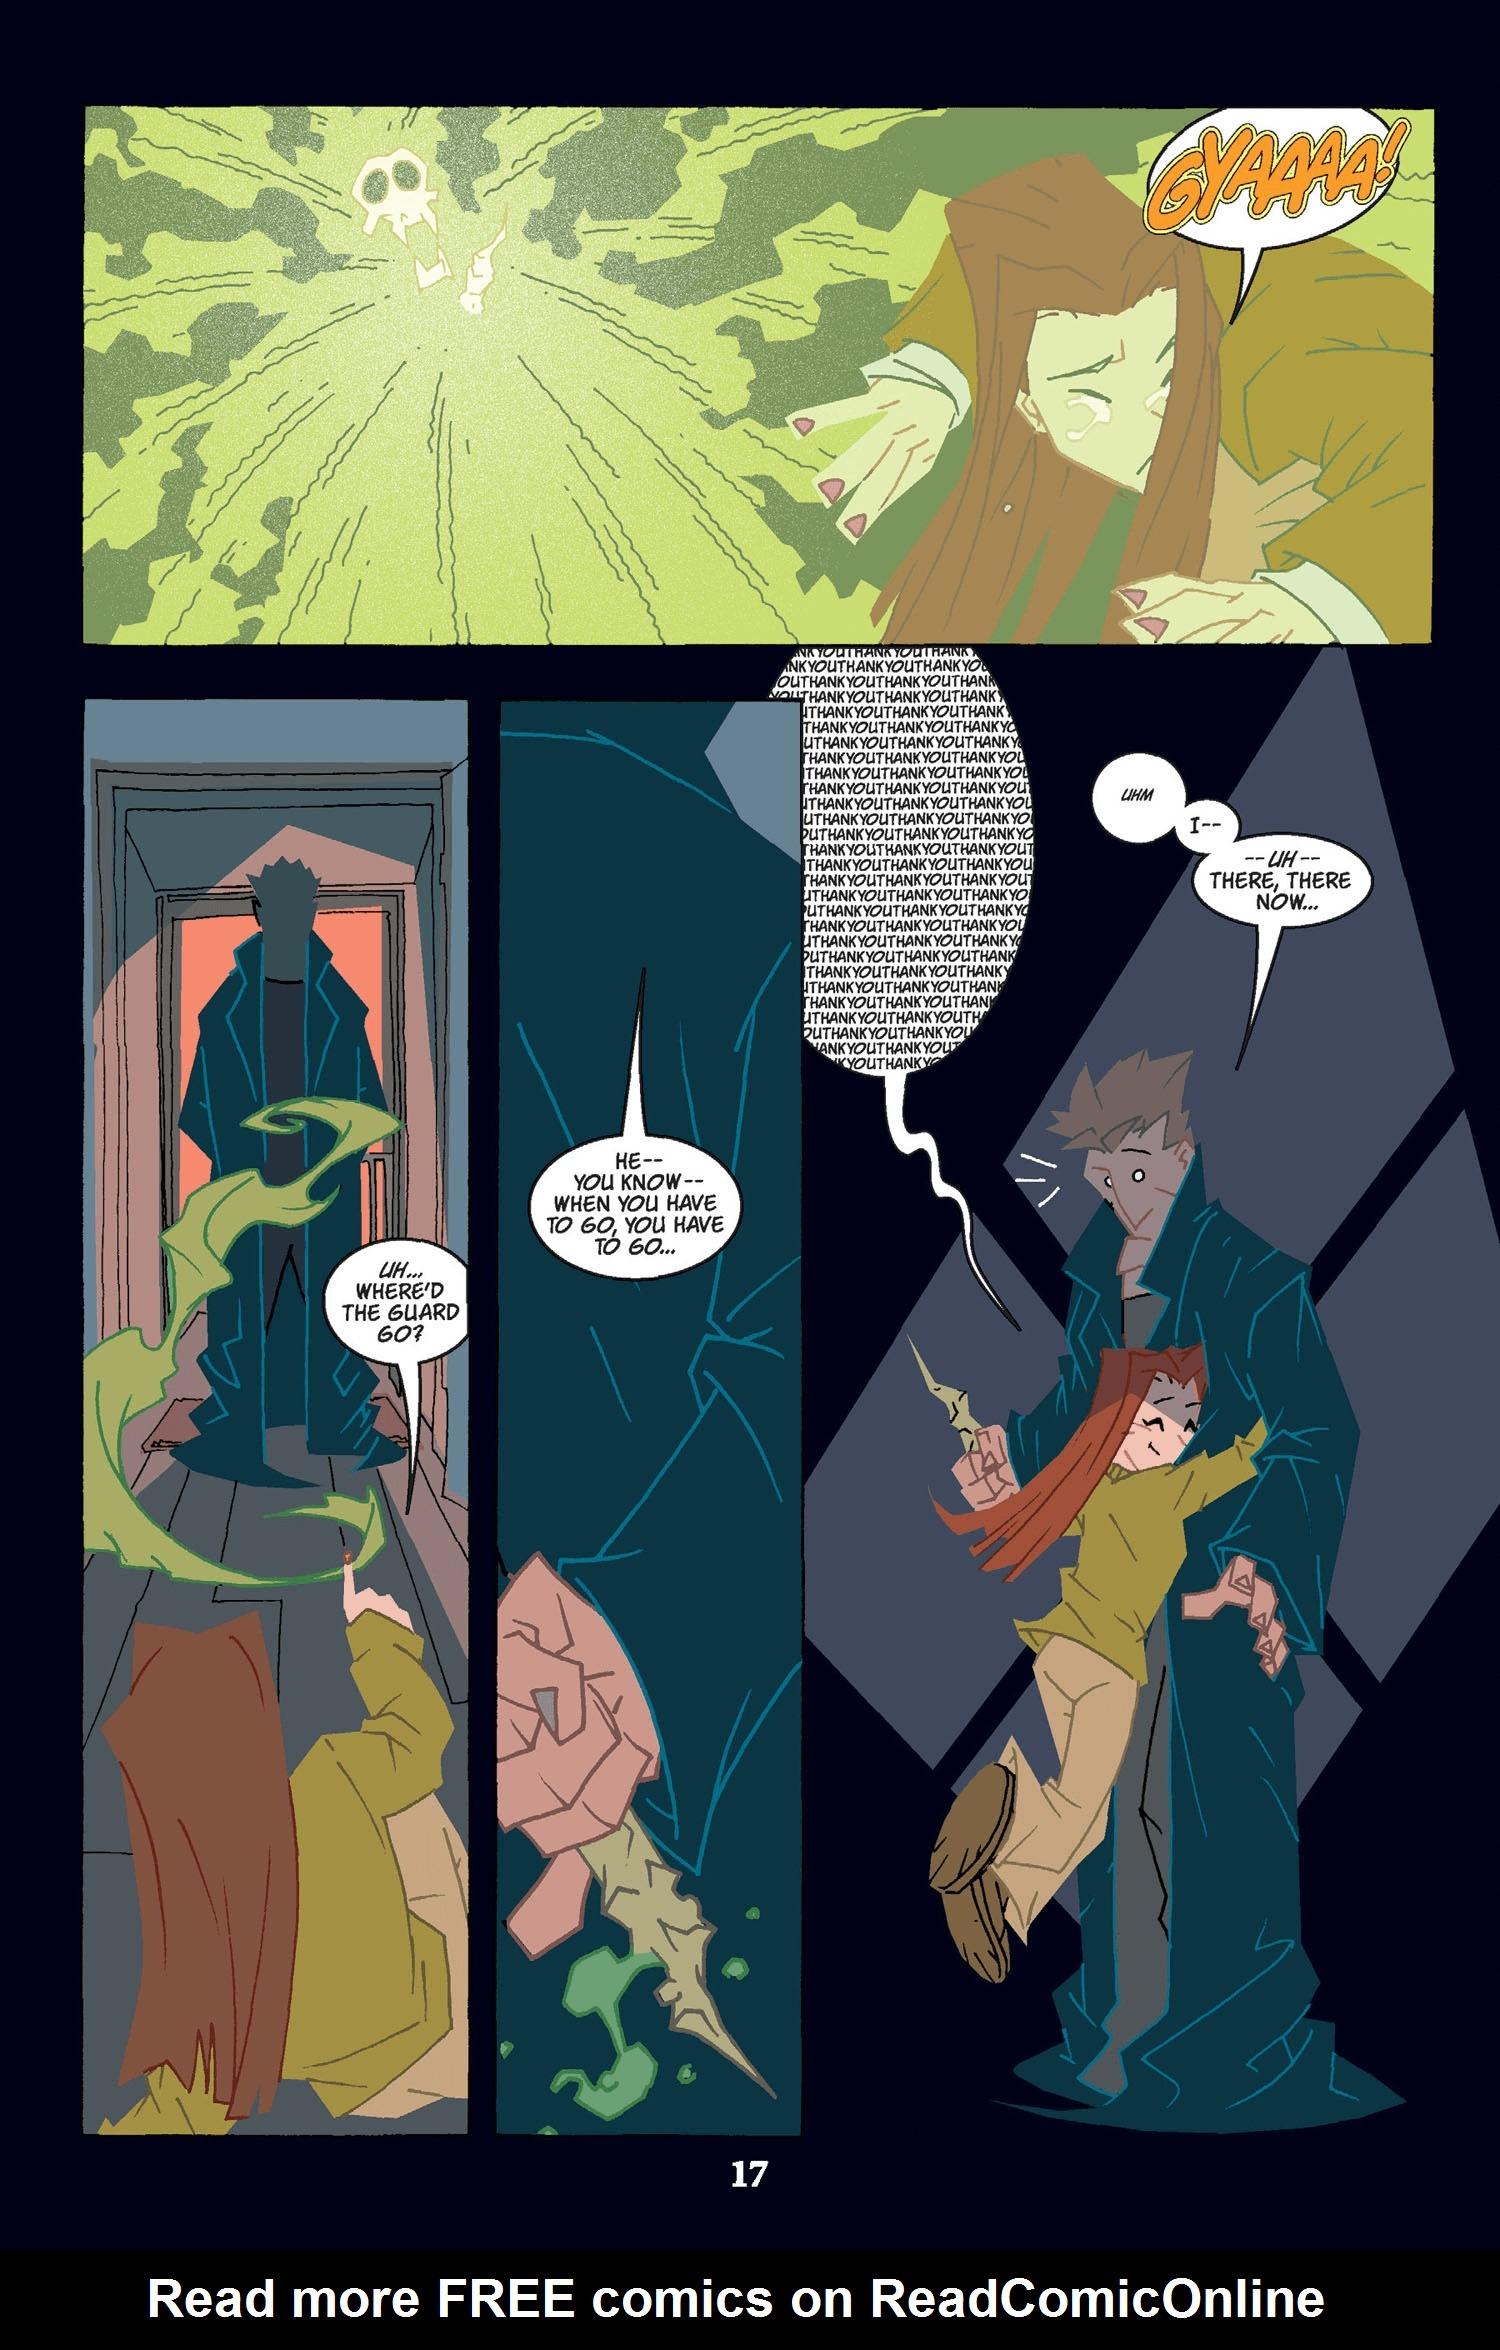 Read online Buffy the Vampire Slayer: Omnibus comic -  Issue # TPB 2 - 17